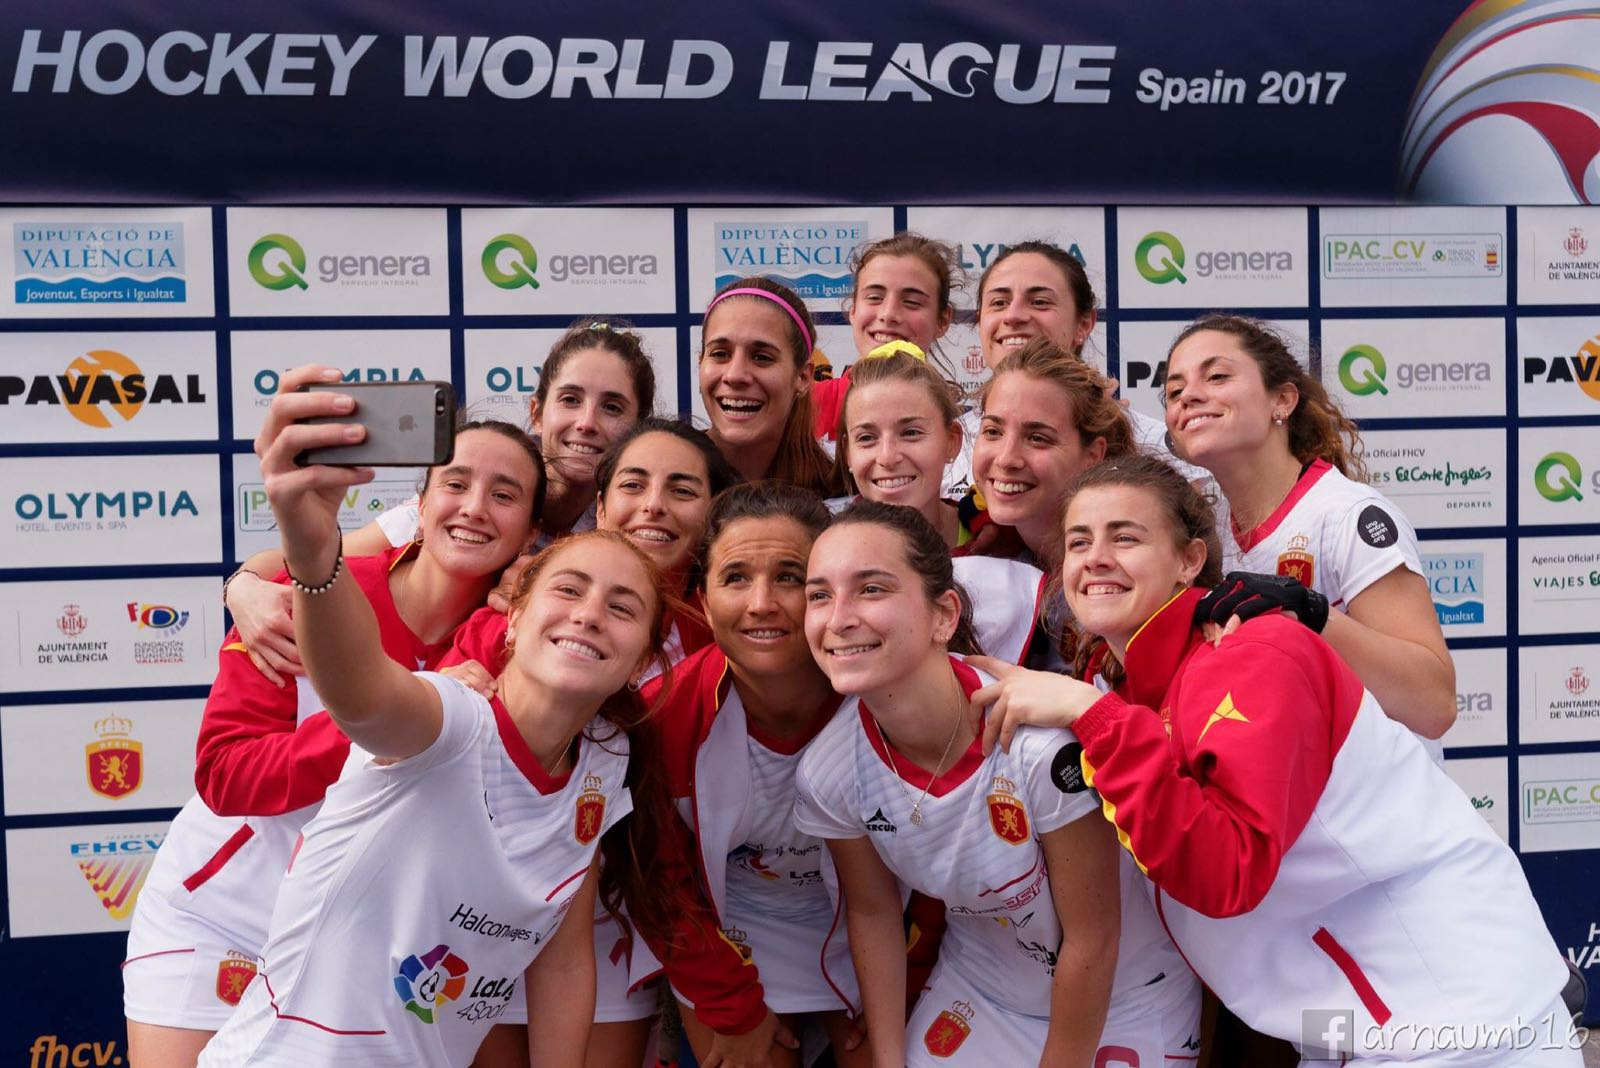 Hockey World League Valencia 2017 -  - Selección Española Absoluta de Hockey Hierba